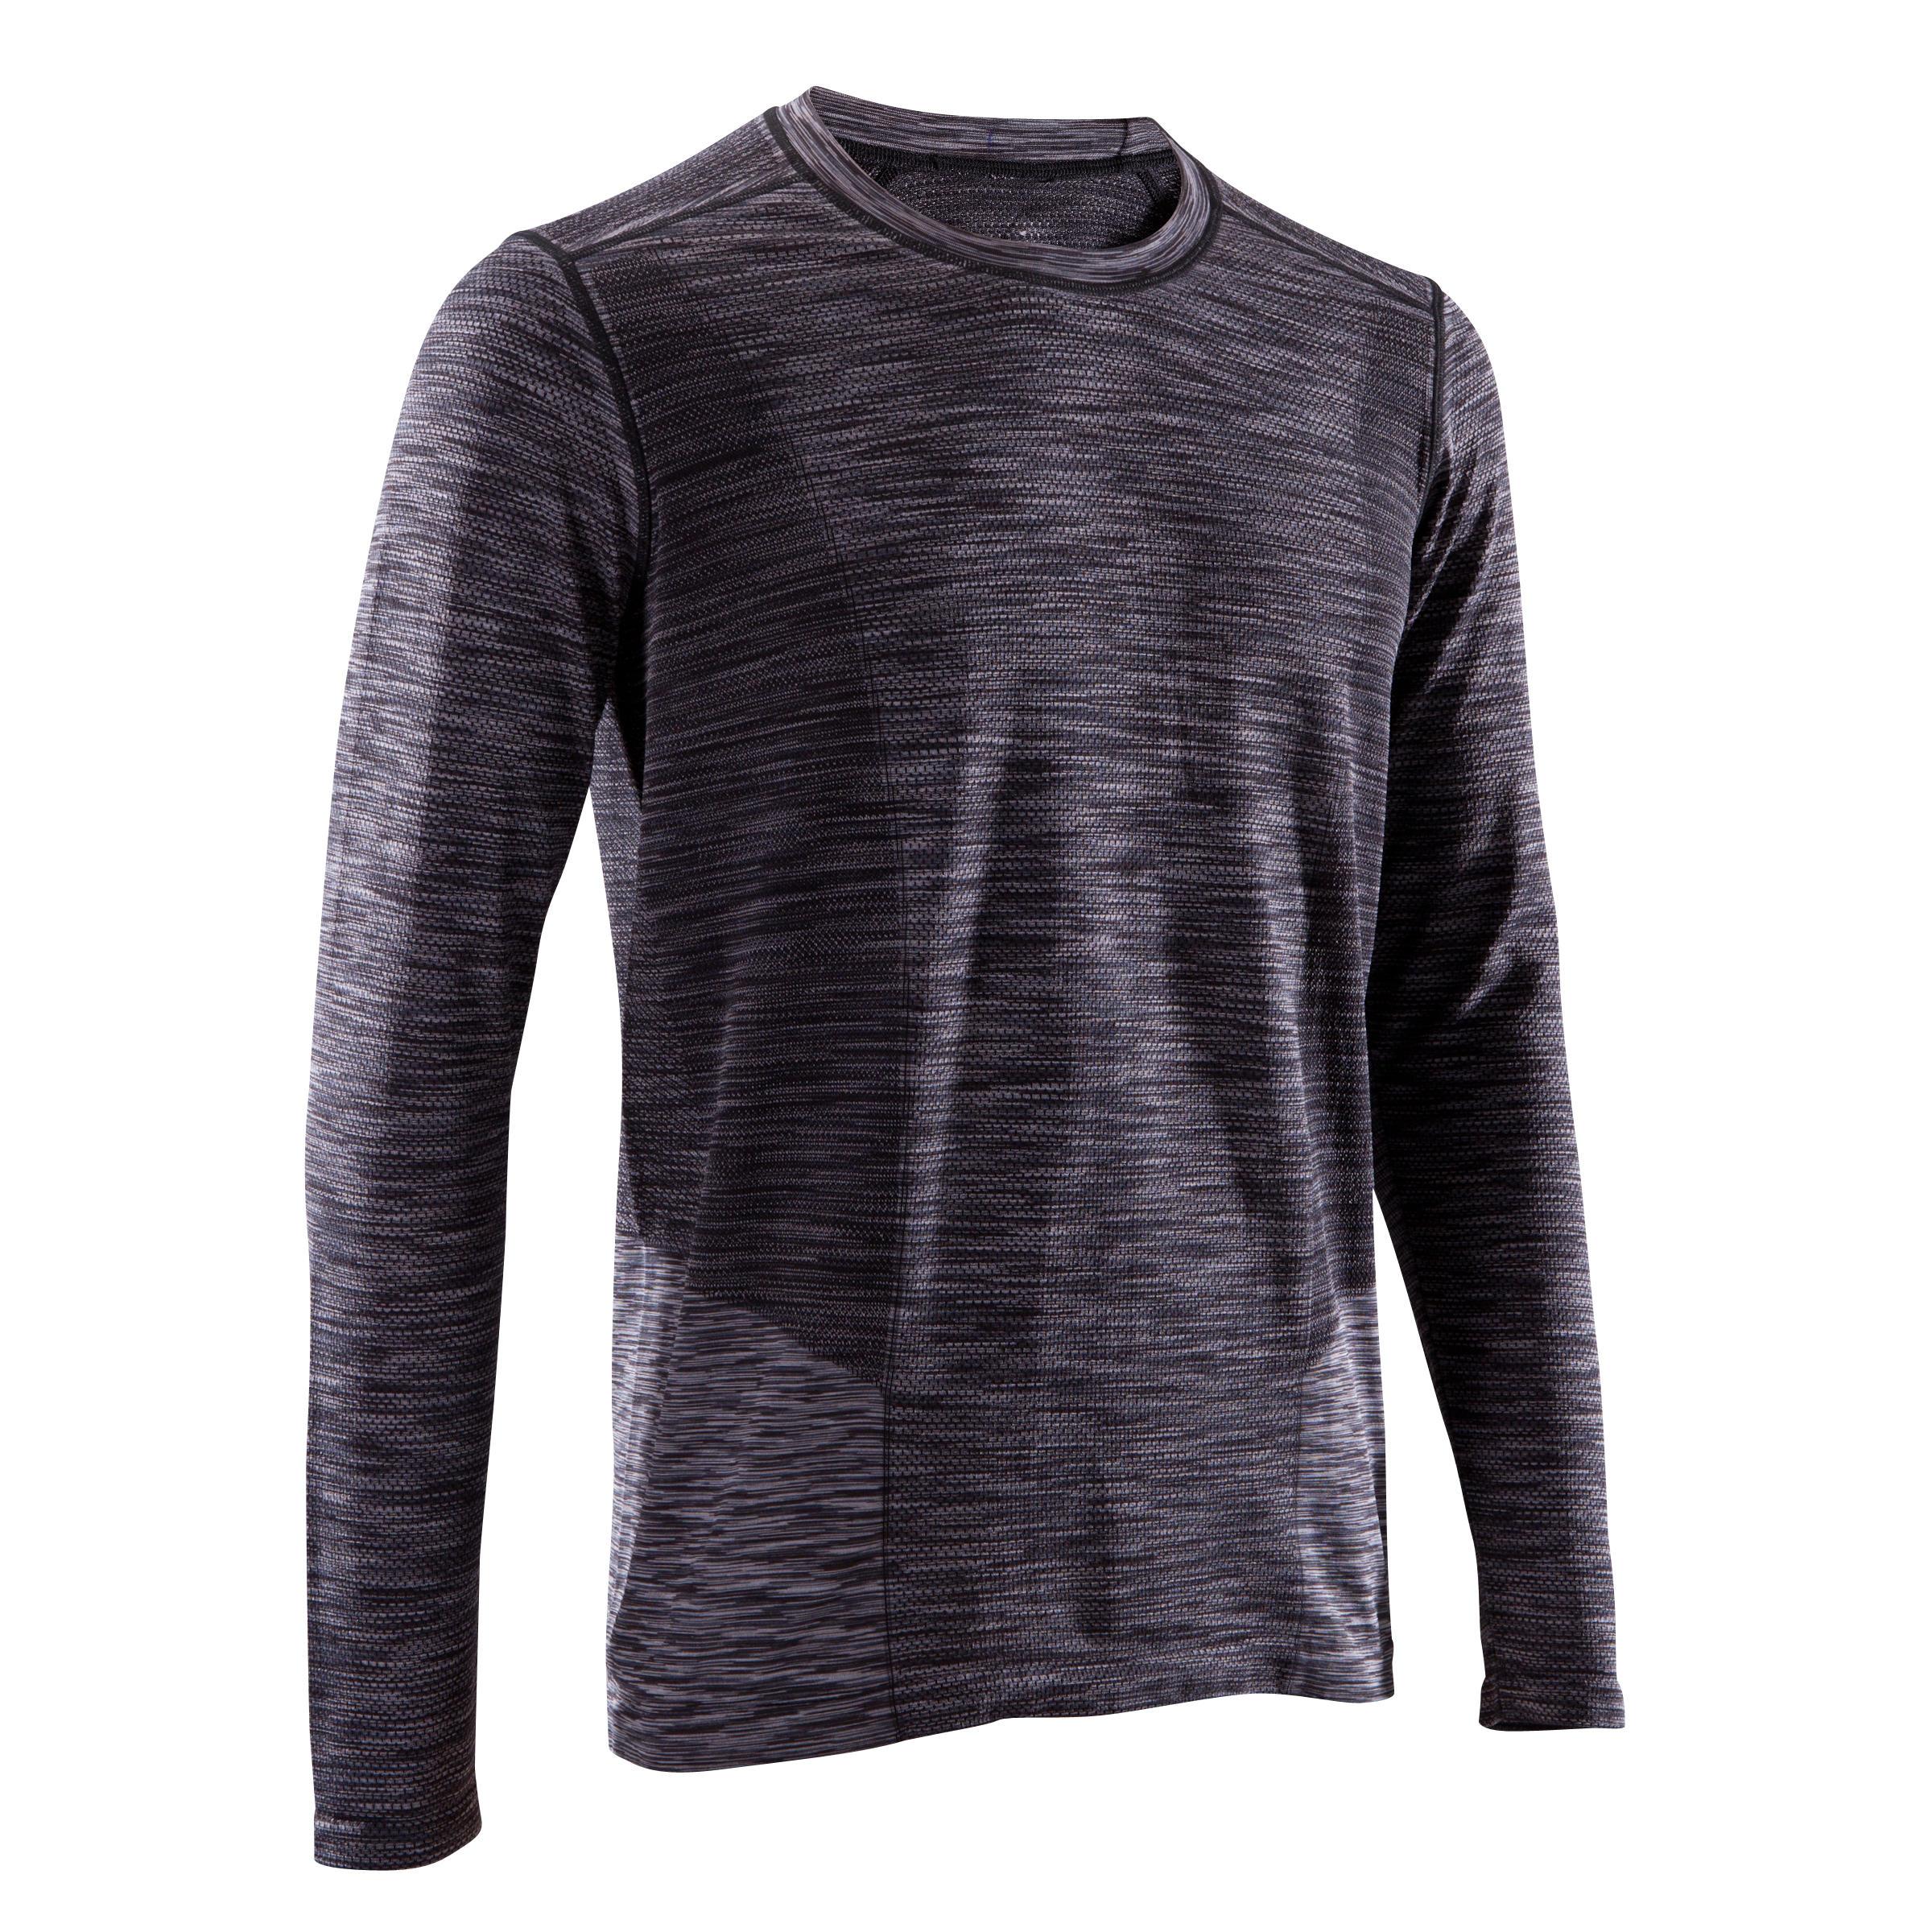 Camiseta de manga larga YOGA sin costuras para hombre negro / gris